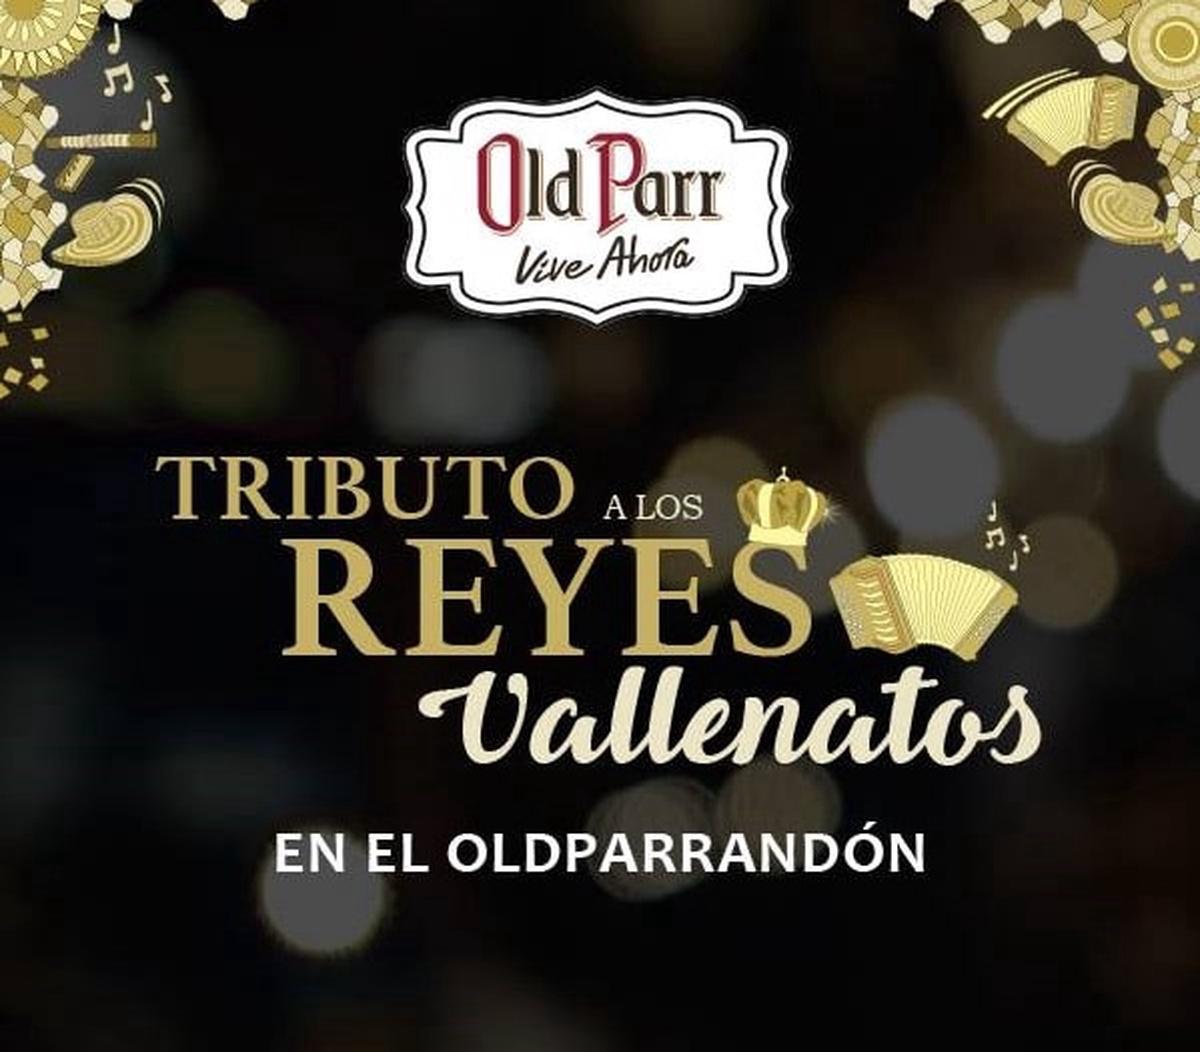 Festival de la Leyenda Vallenata Old Parr - Pulzo.com